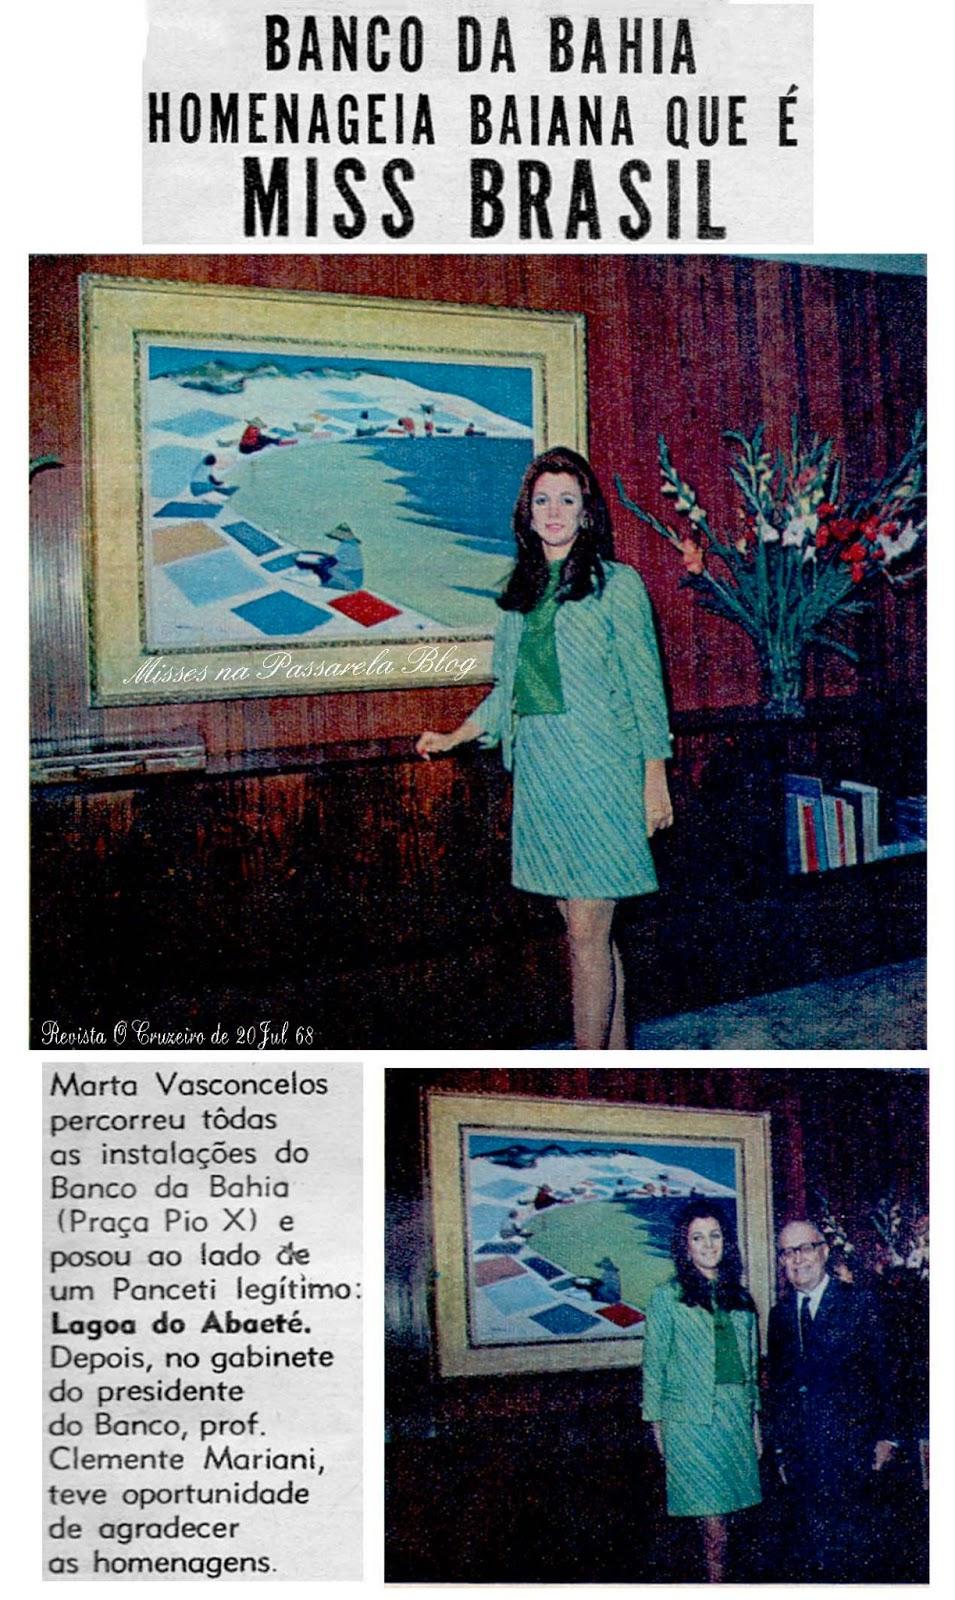 martha vasconcelos, miss universe 1968. - Página 2 Martha13